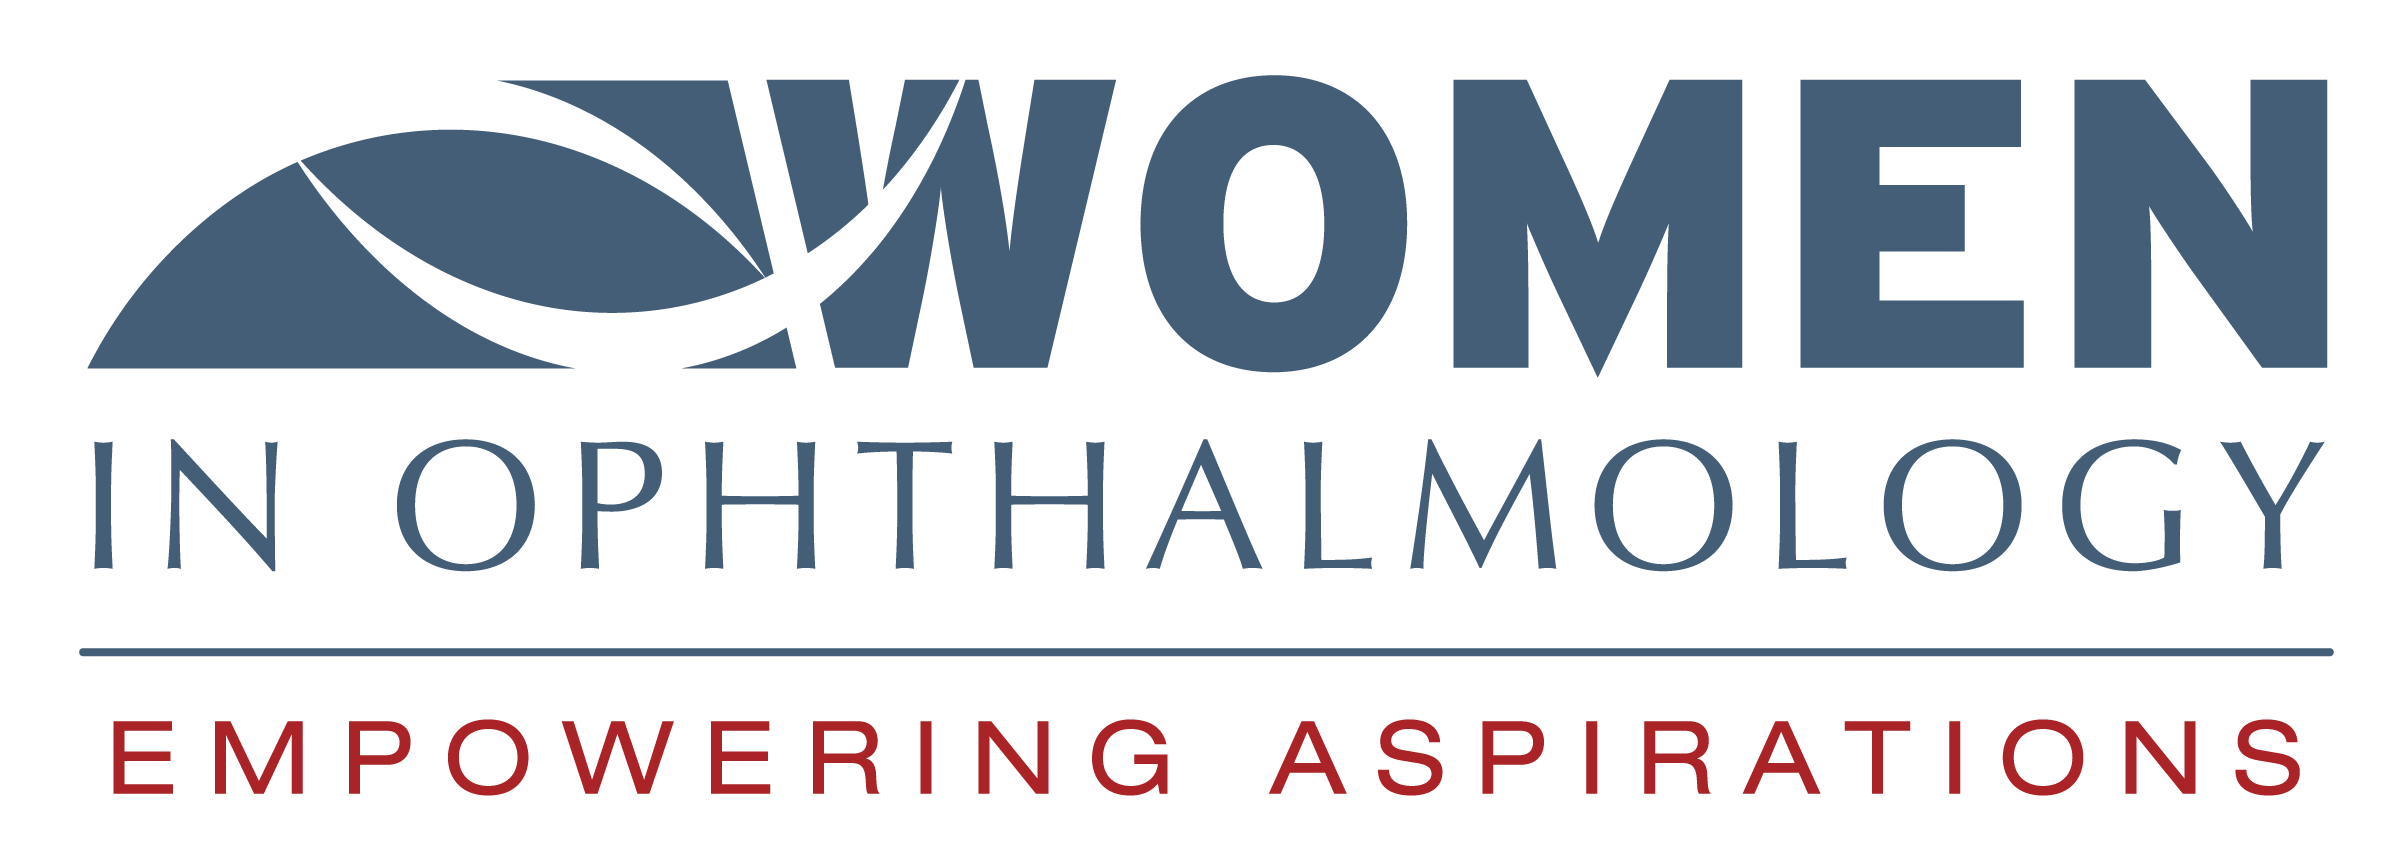 WIO-logo_2400w.png